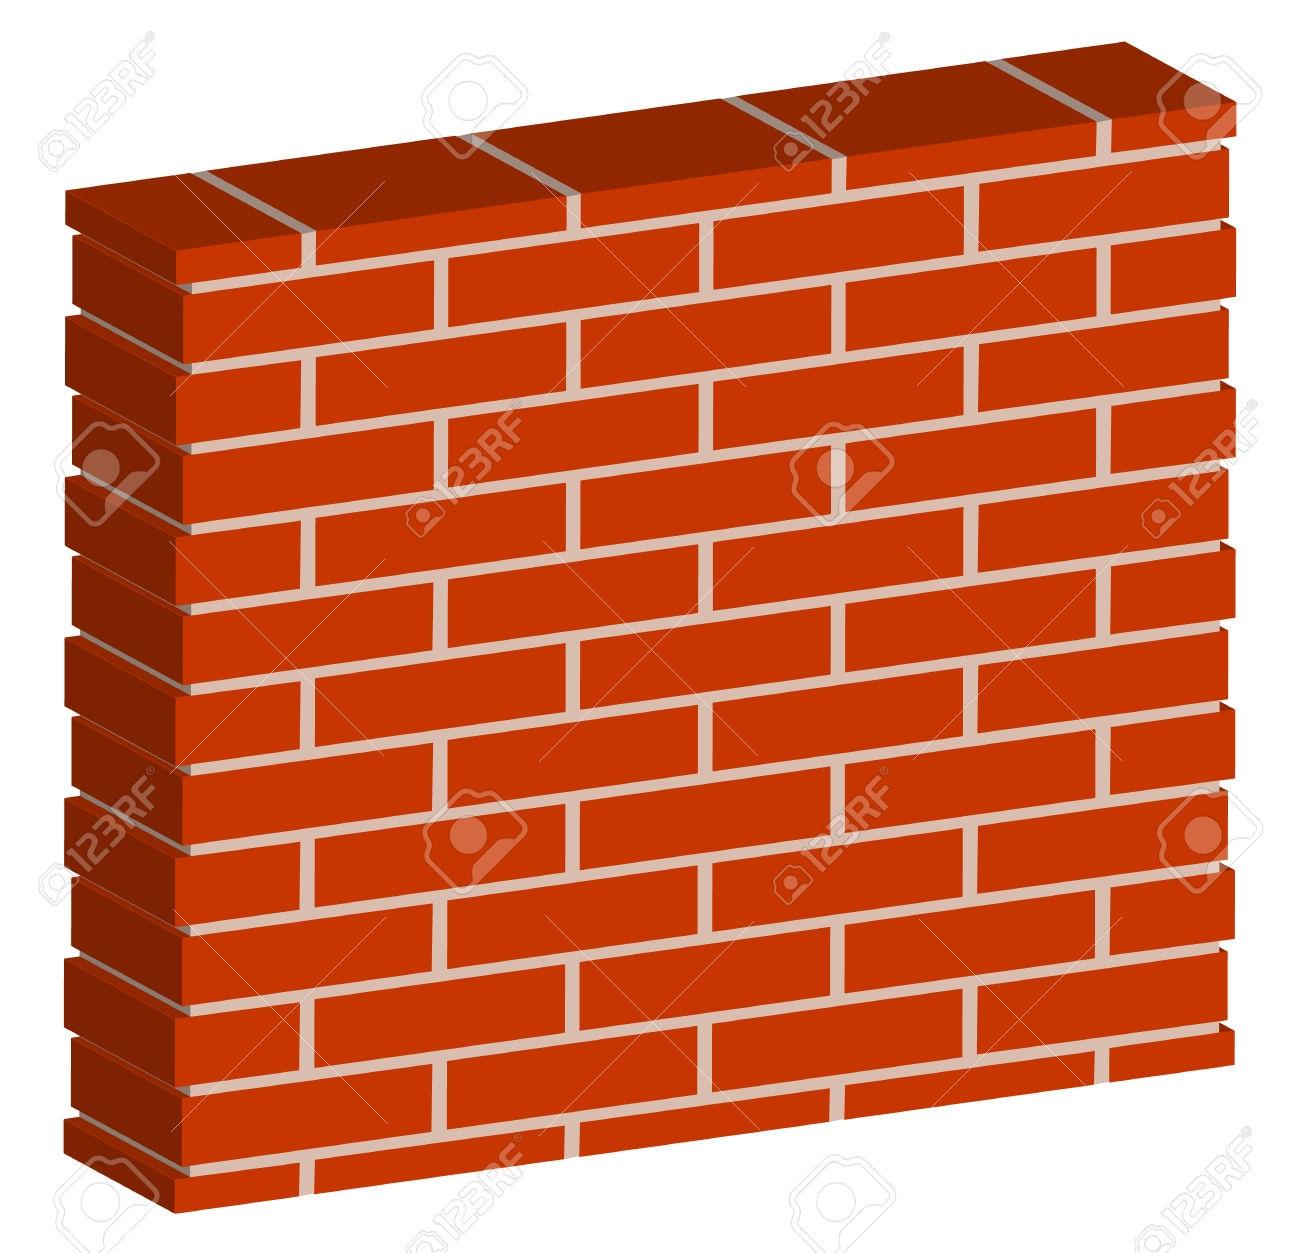 Building Brick Wall Clipart.